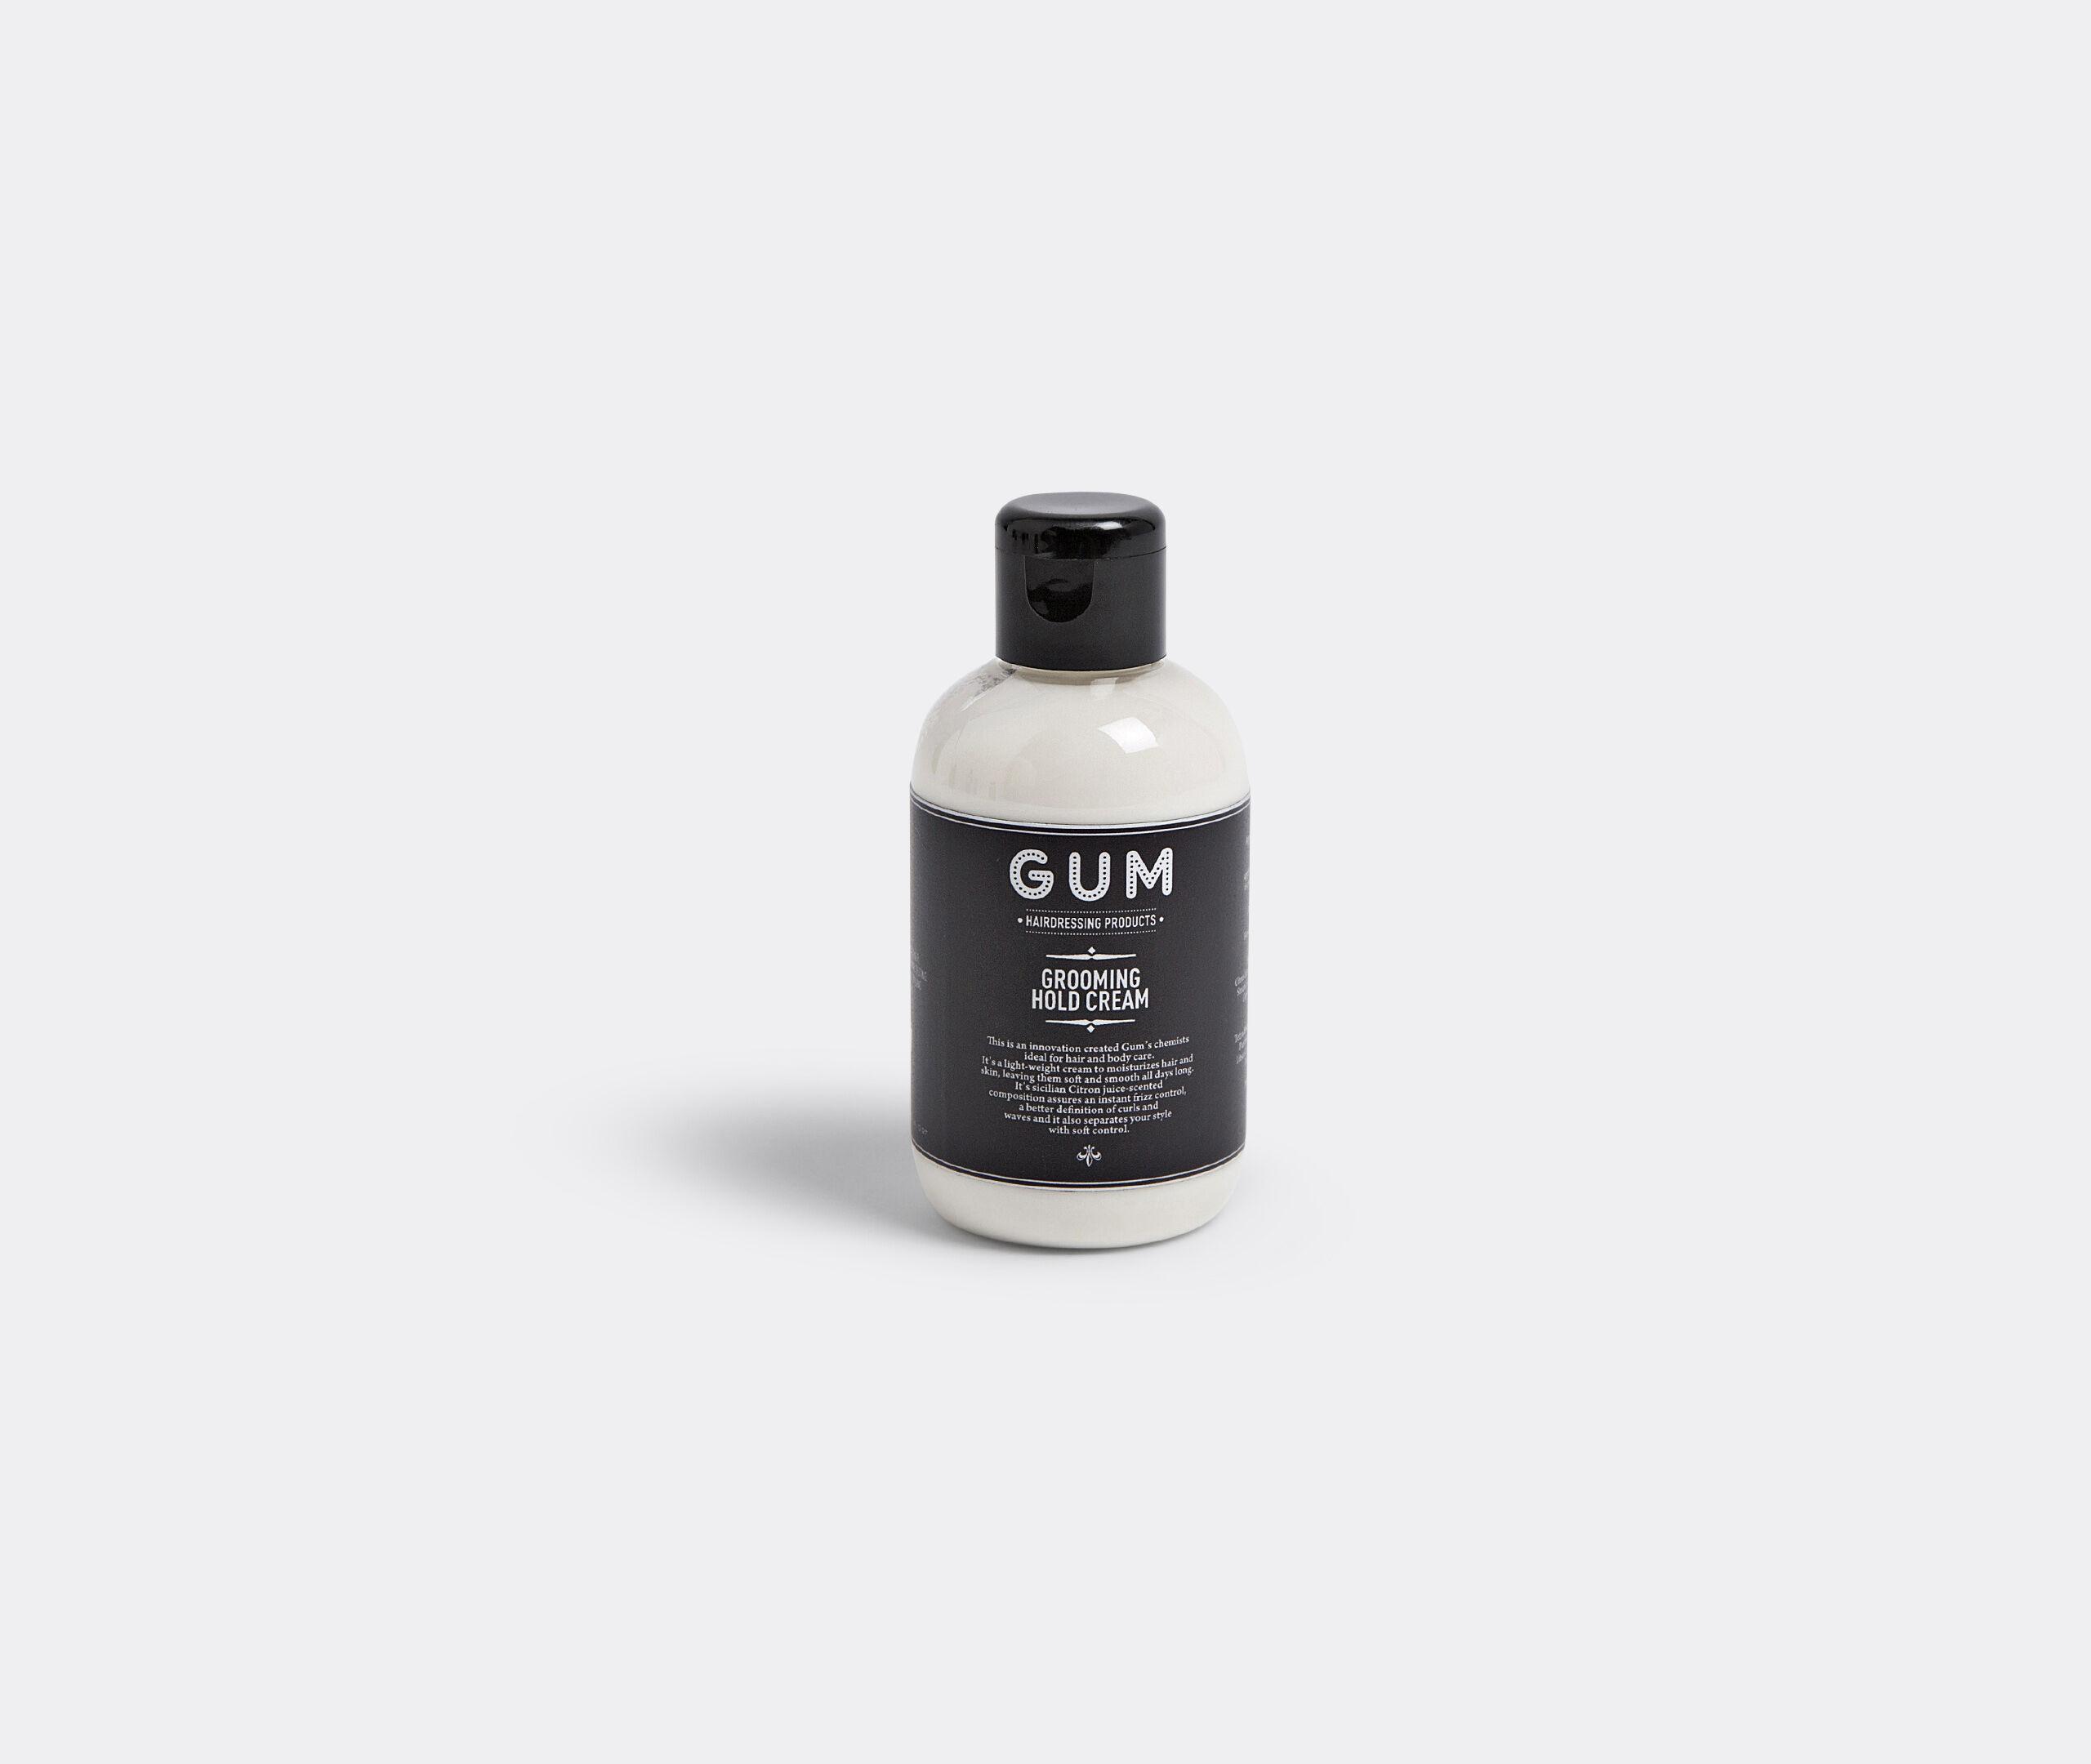 Gum Grooming Hold Cream 100 Ml